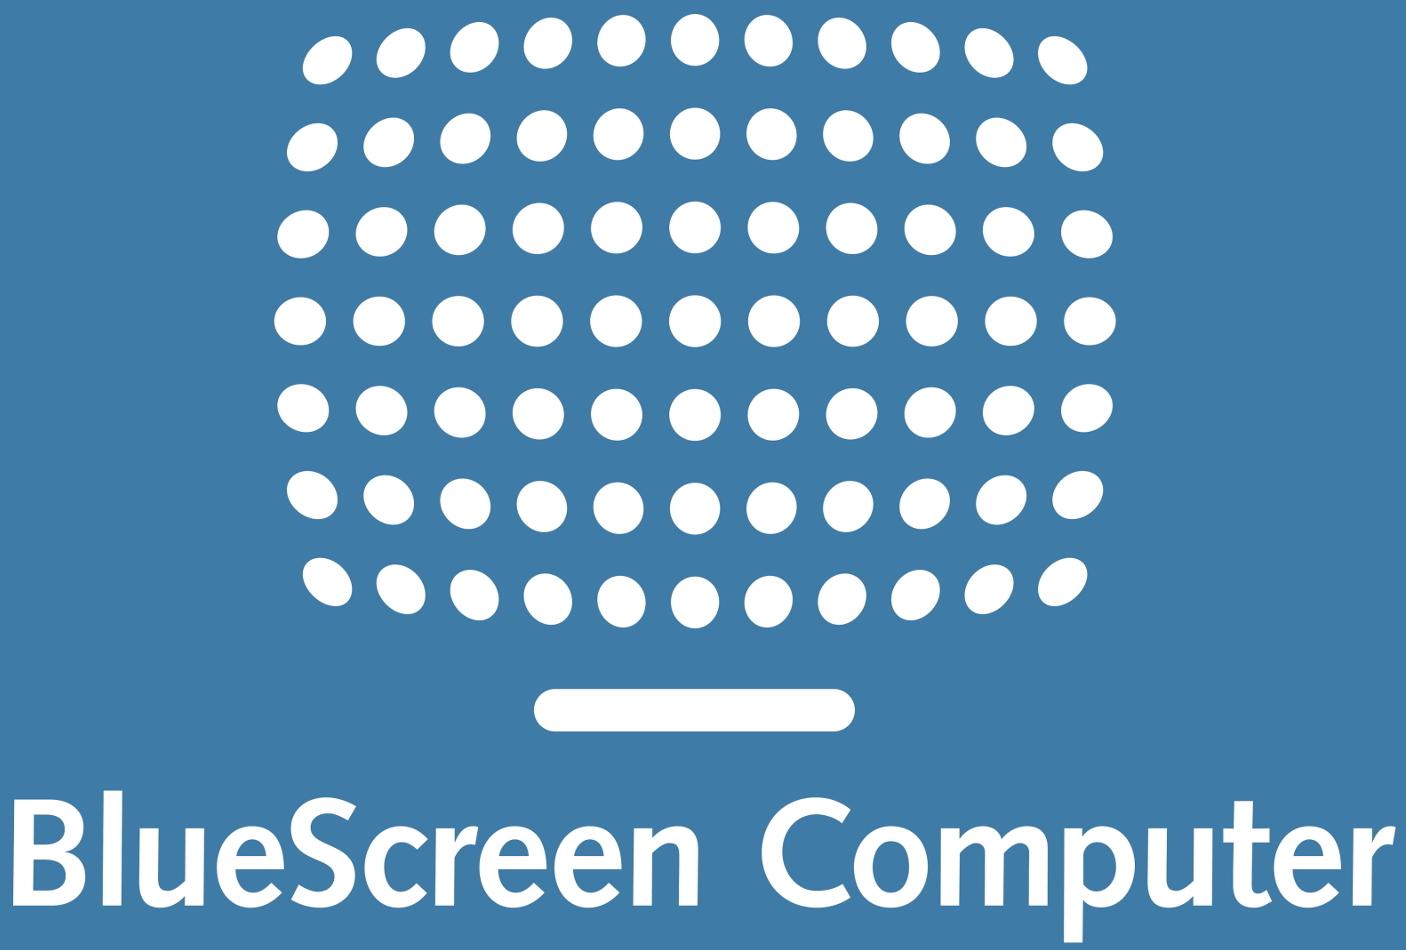 BlueScreen Computer